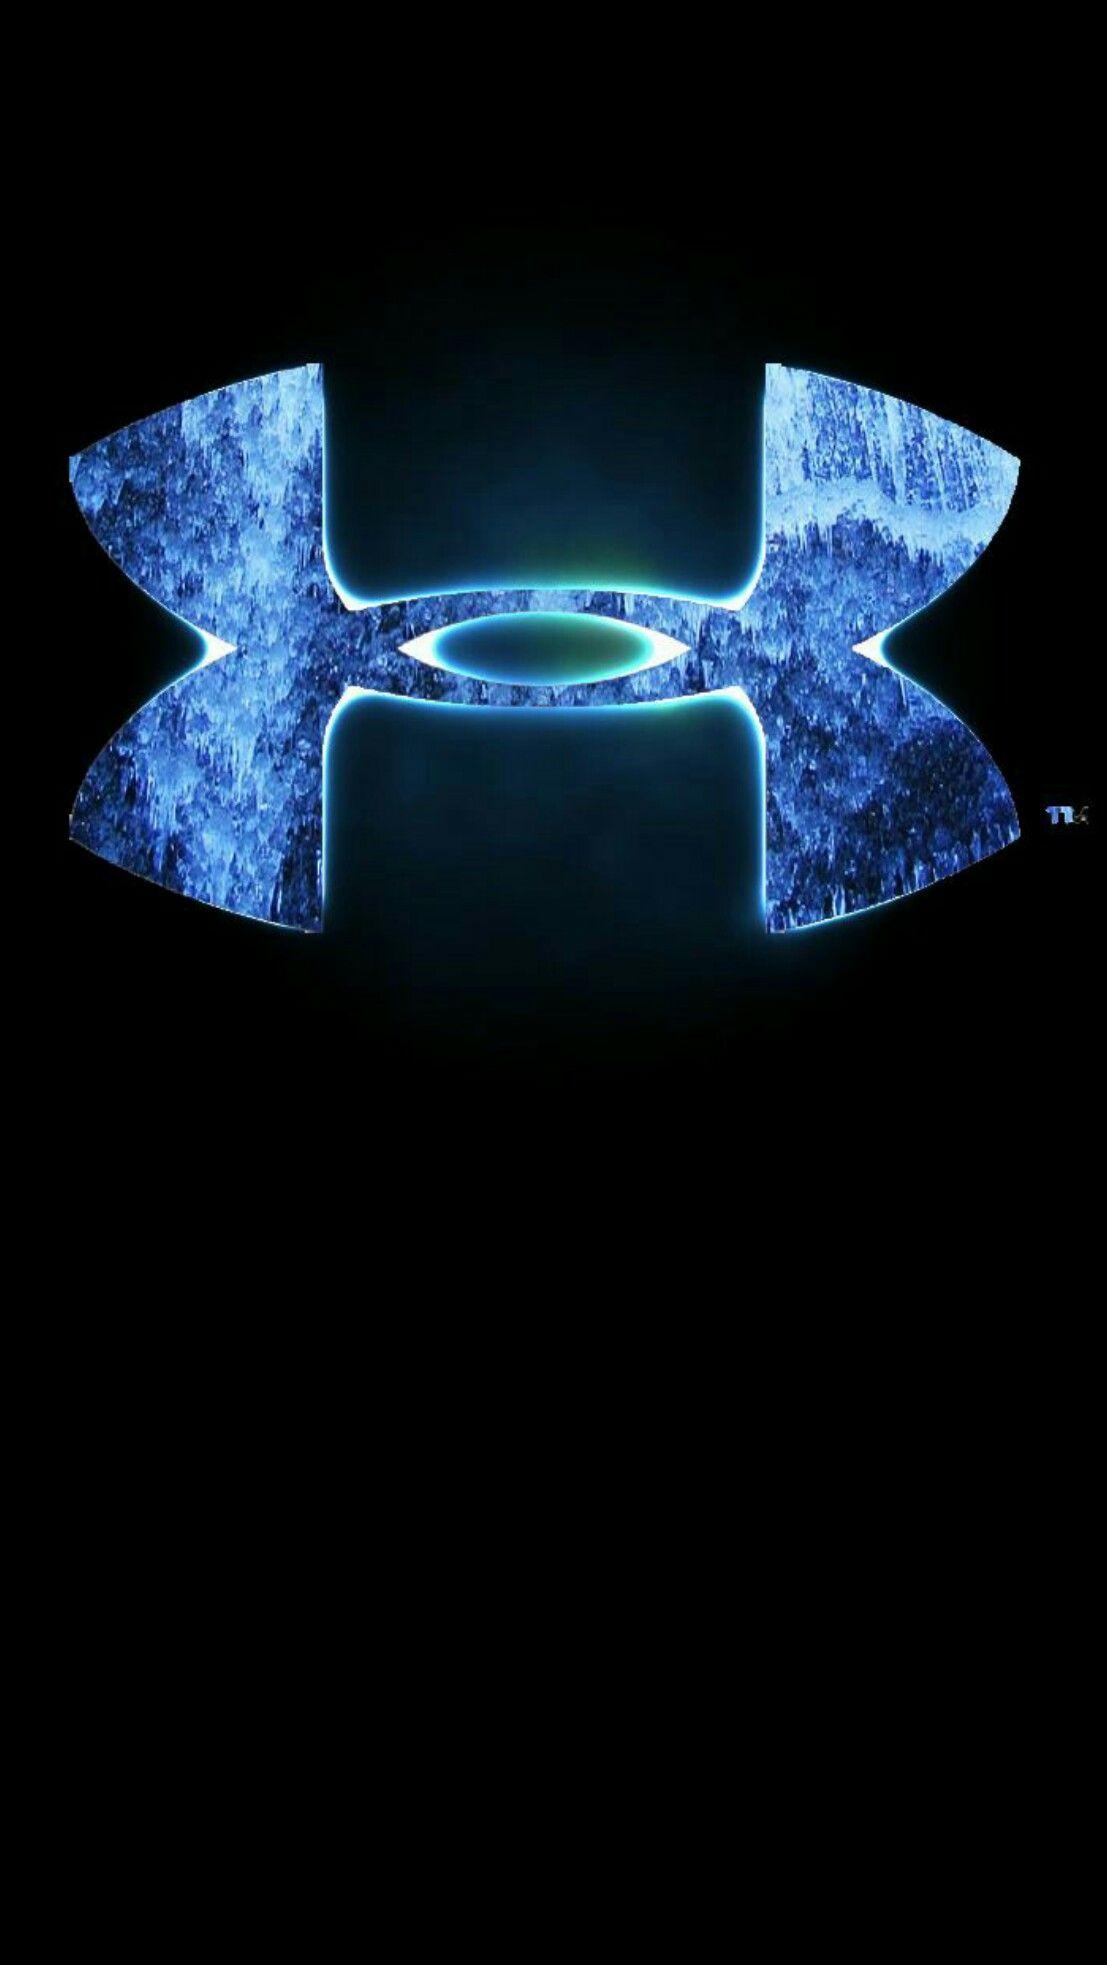 #underarmour #black #wallpaper #iPhone #android | Under Armor